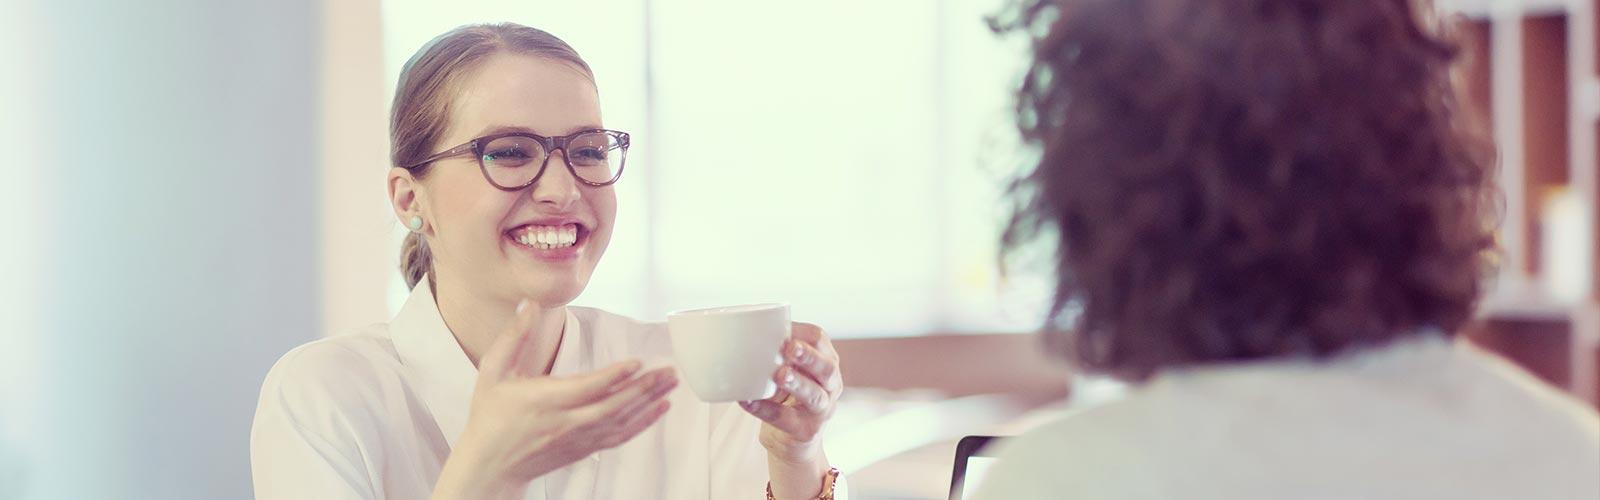 Smiling Customer - Zufriedene Kundin